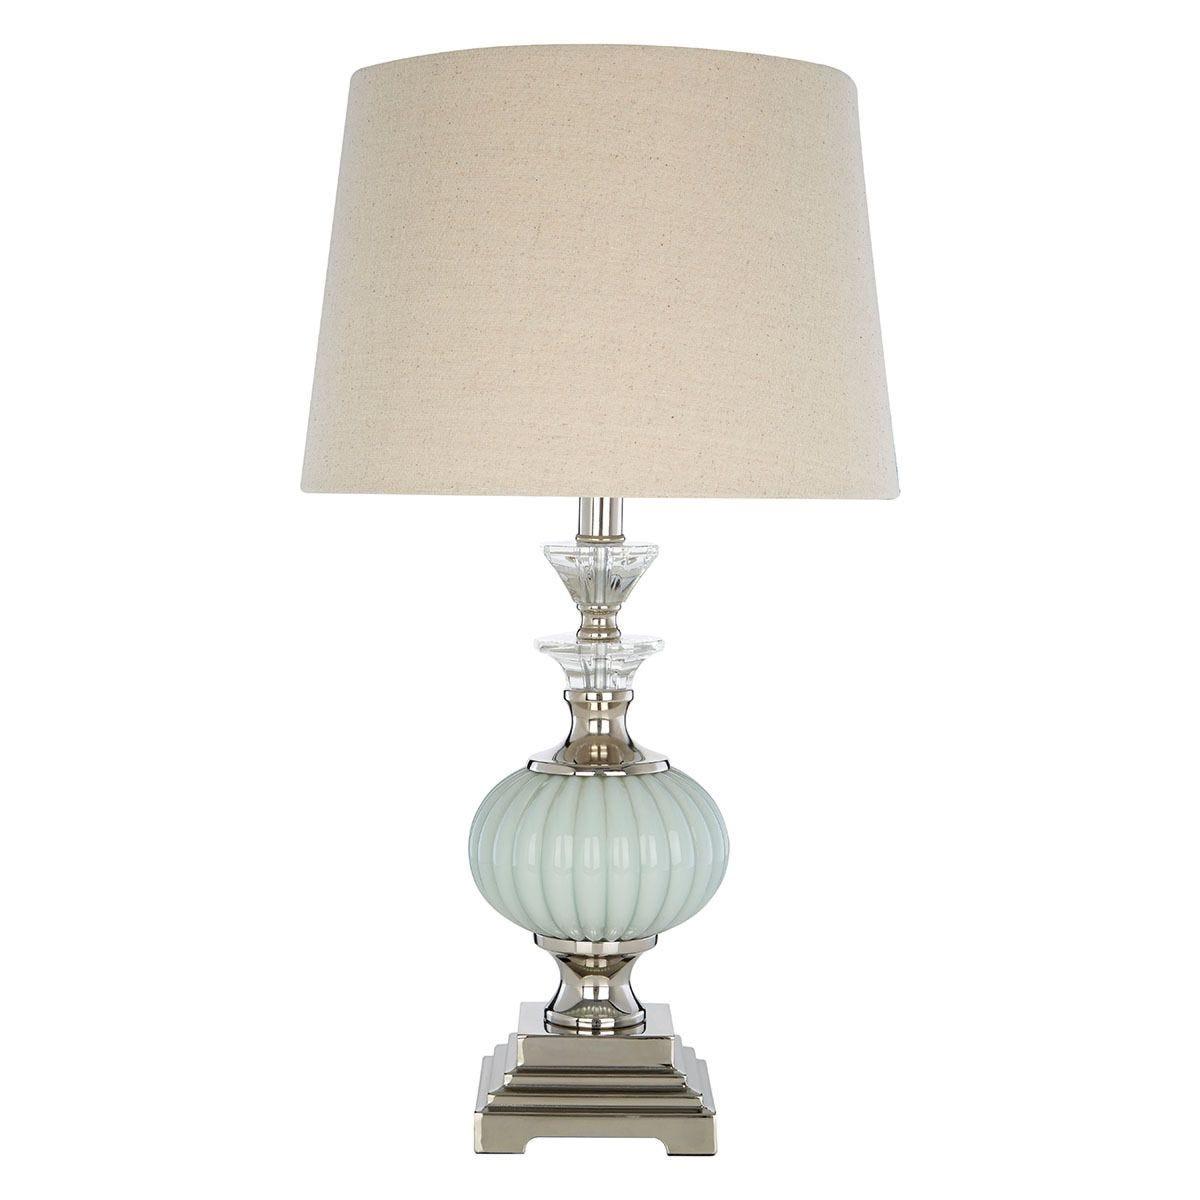 Premier Housewares Ulyana Table Lamp with Natural Shade